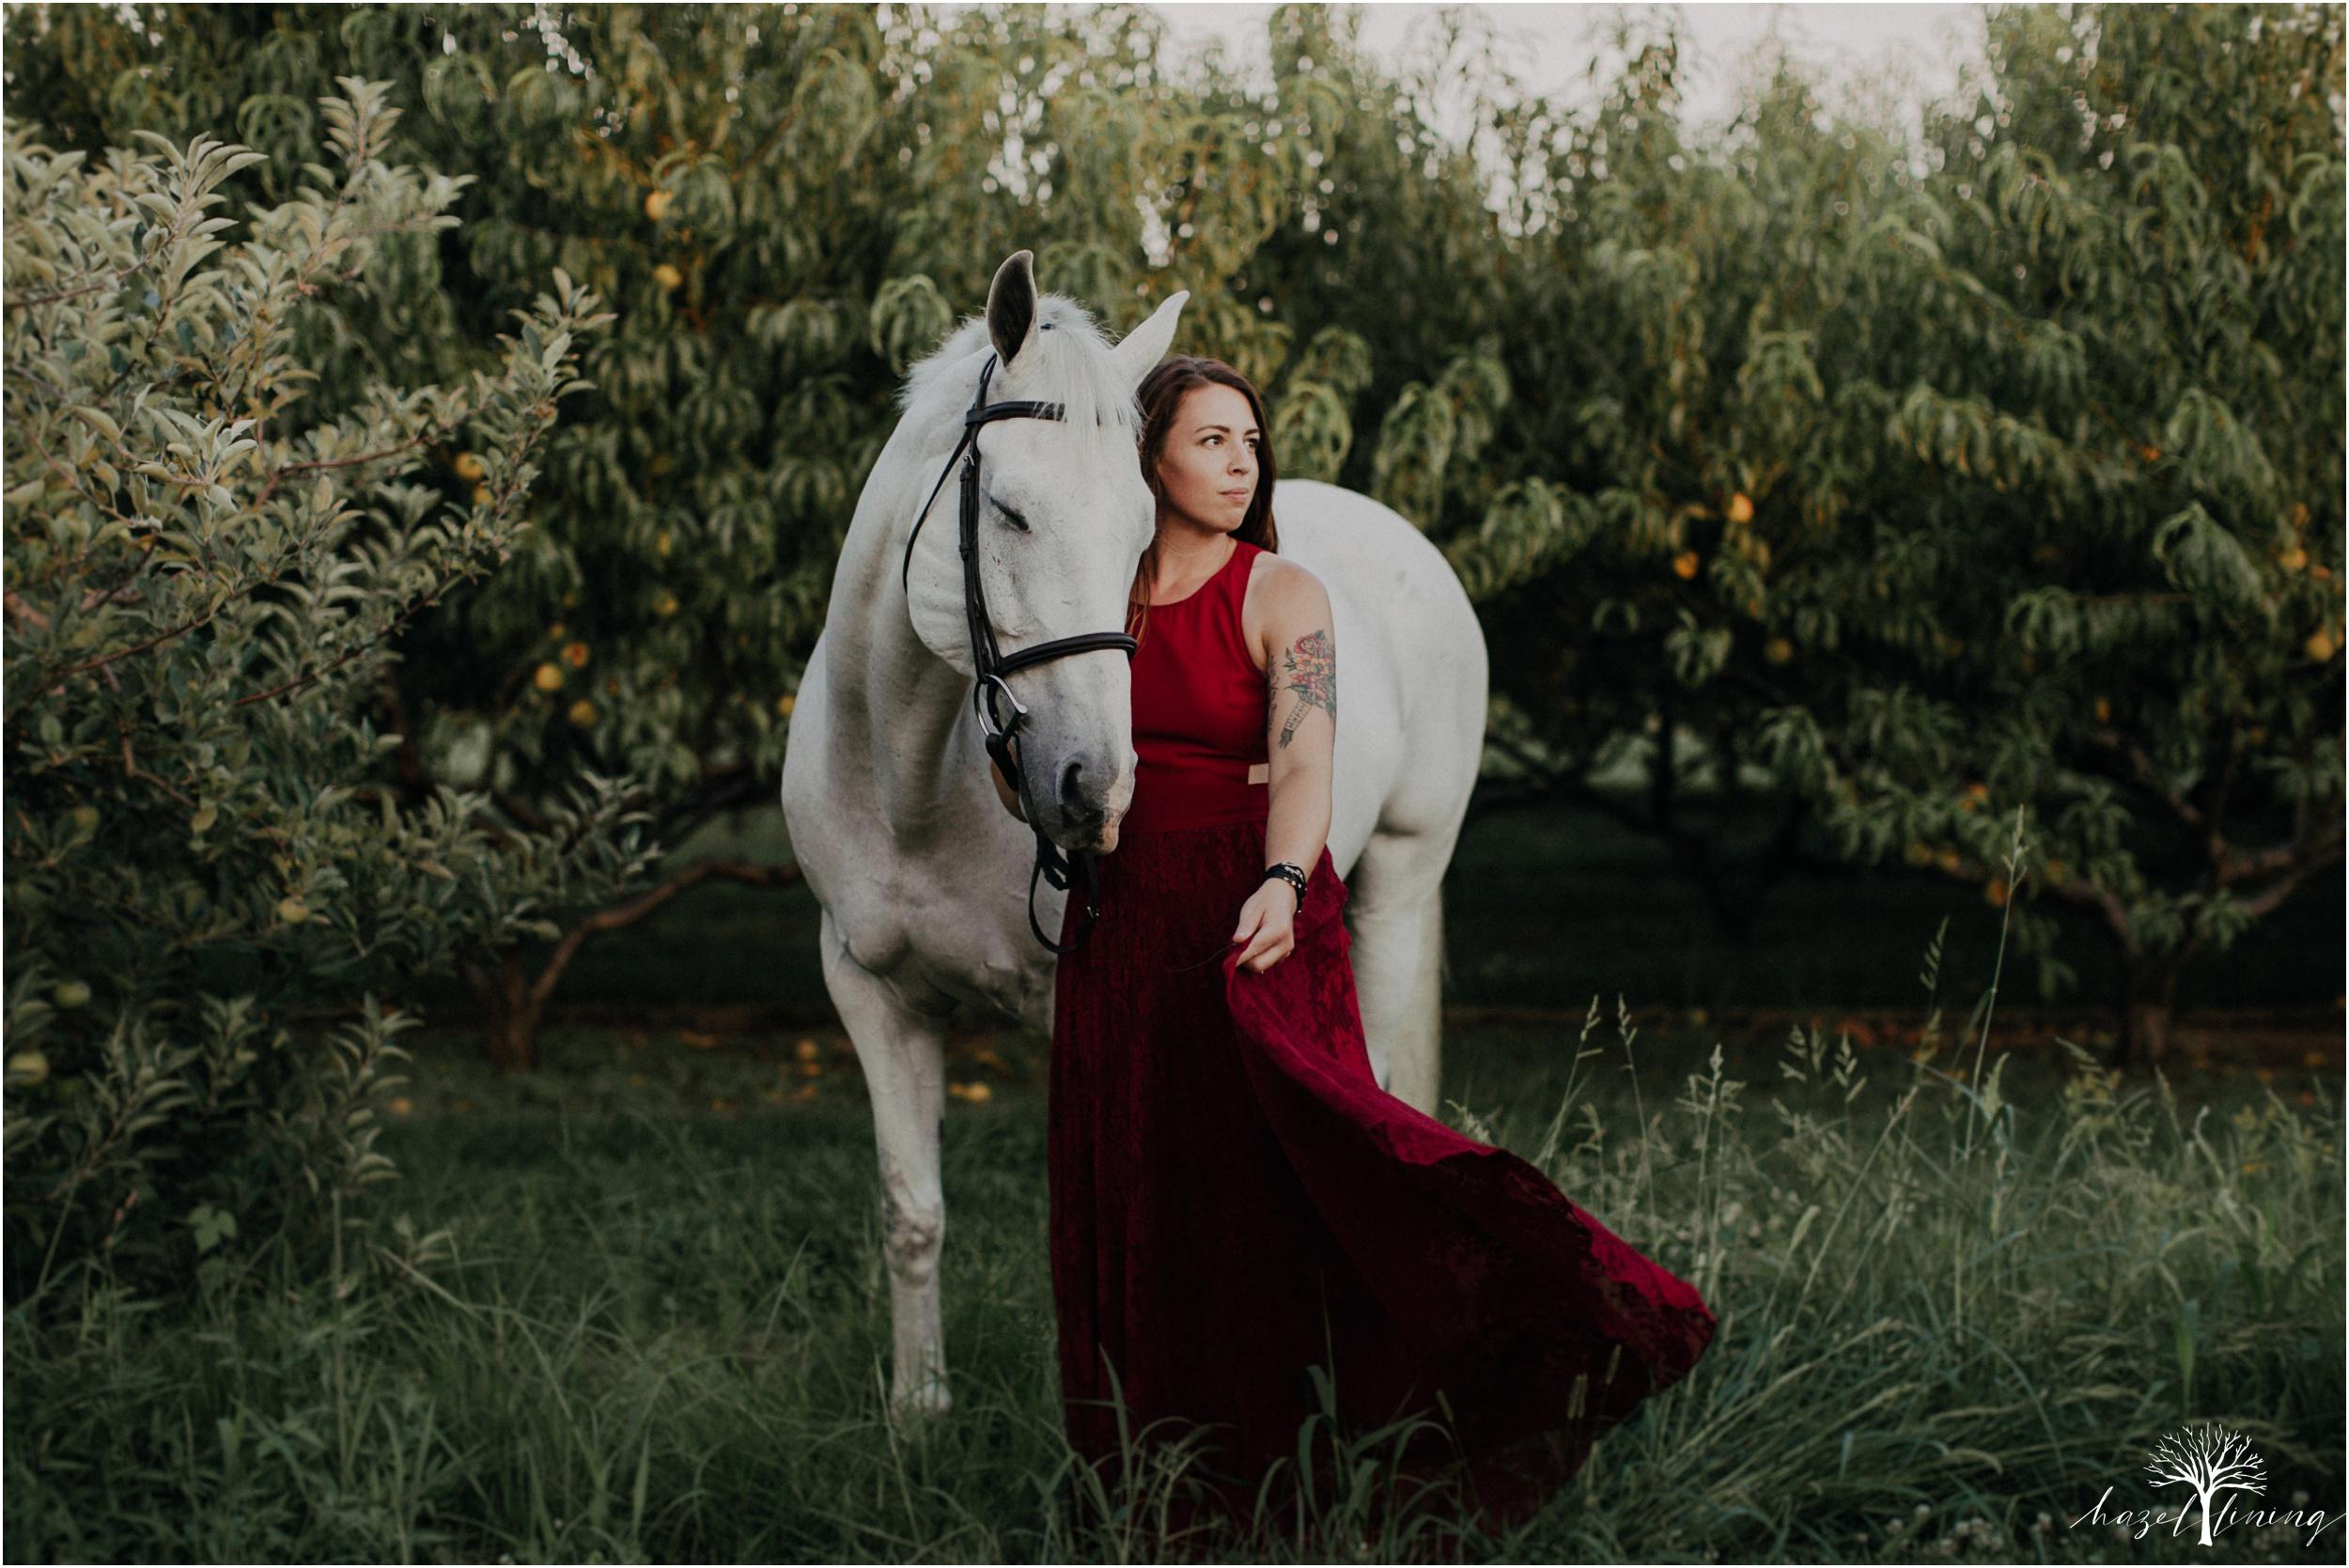 taylor-adams-and-horse-delaware-valley-university-delval-summer-equestrian-portrait-session-hazel-lining-photography-destination-elopement-wedding-engagement-photography_0046.jpg